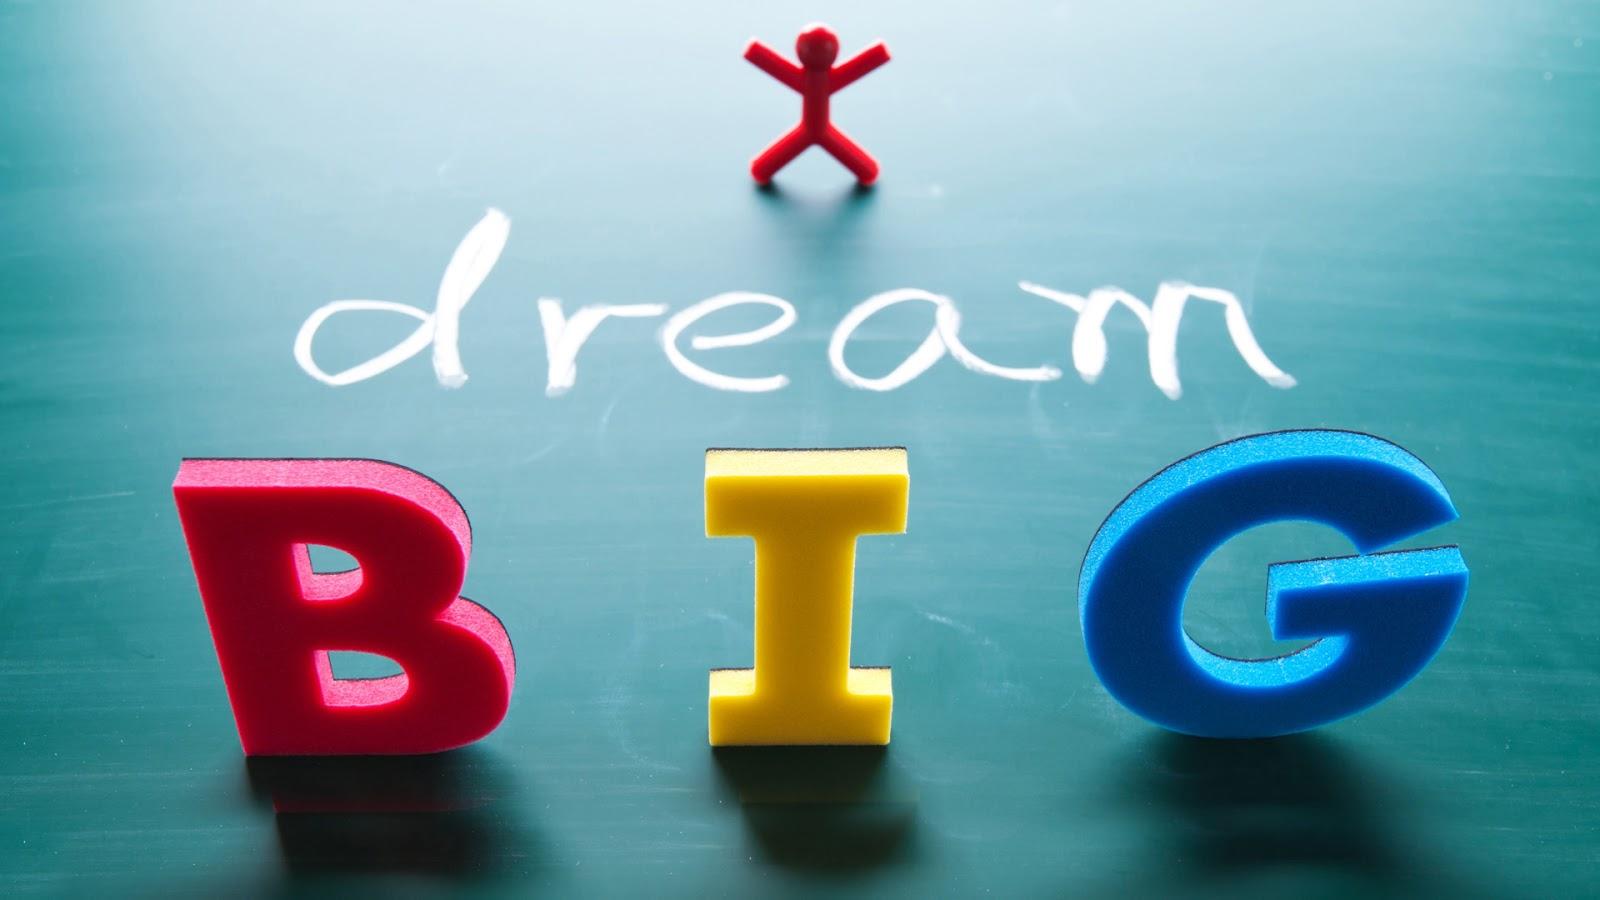 http://www.neelwritesthisblog.com/2013/07/follow-your-dreams.html